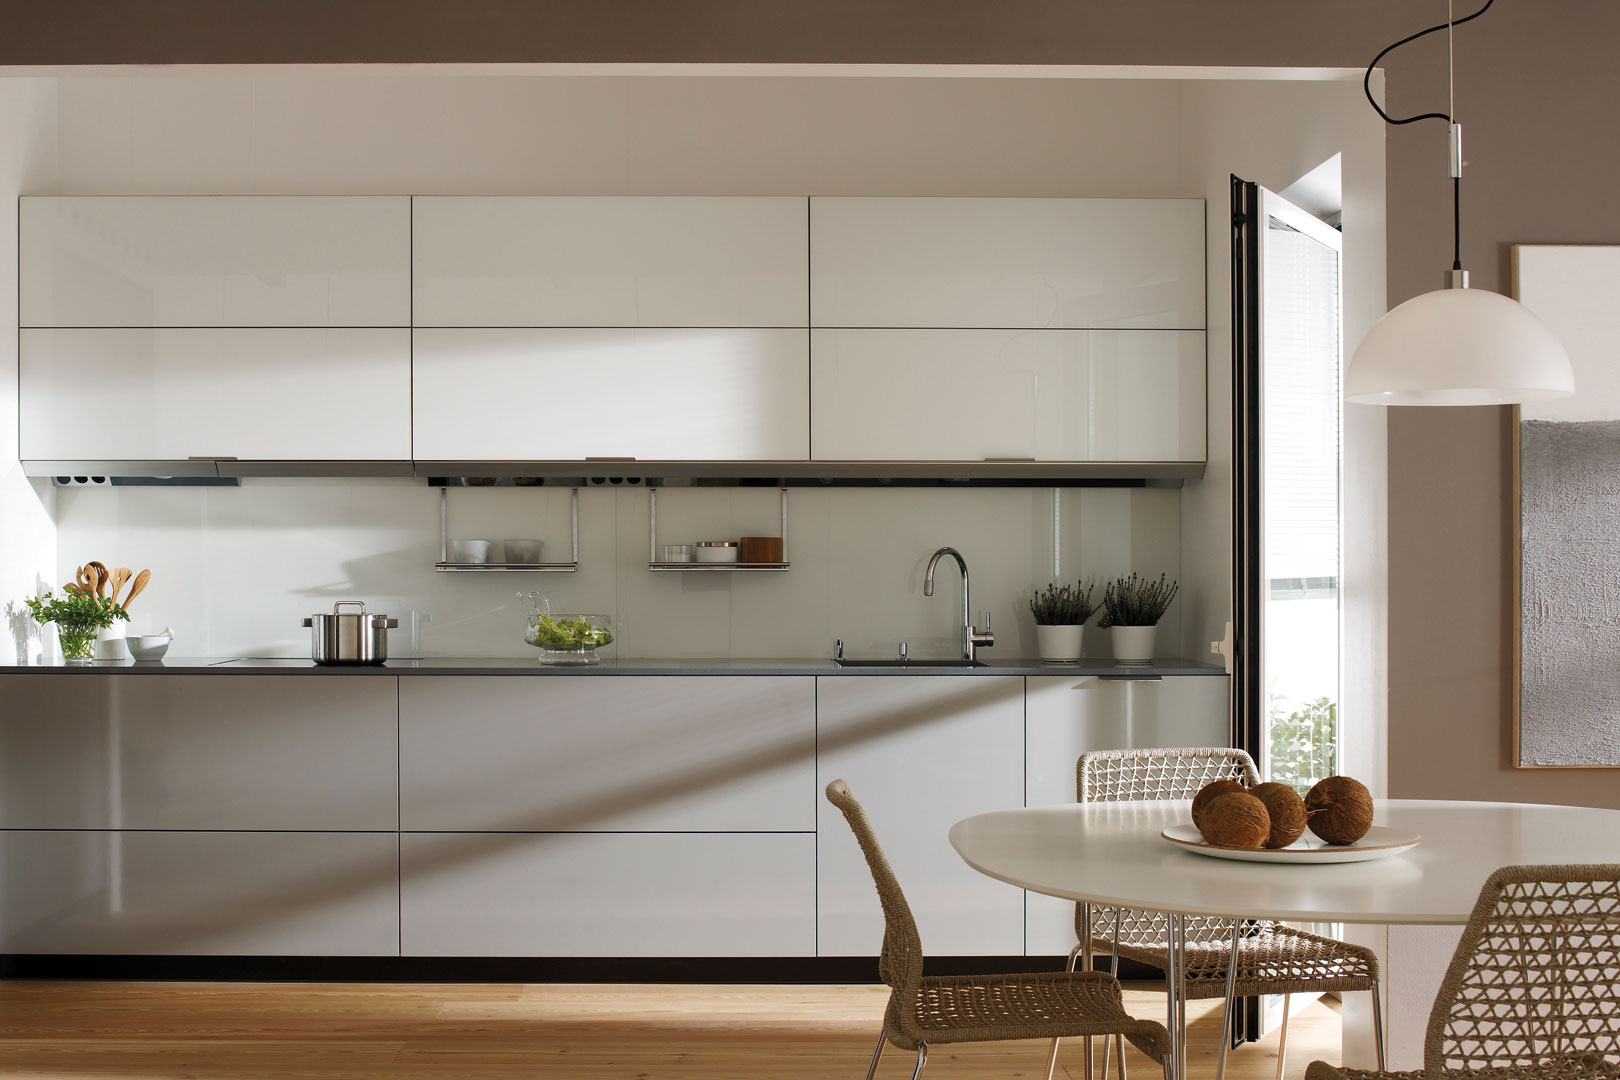 Cocinas grises tendencias cocinas santos santiago for Interiores de cocinas